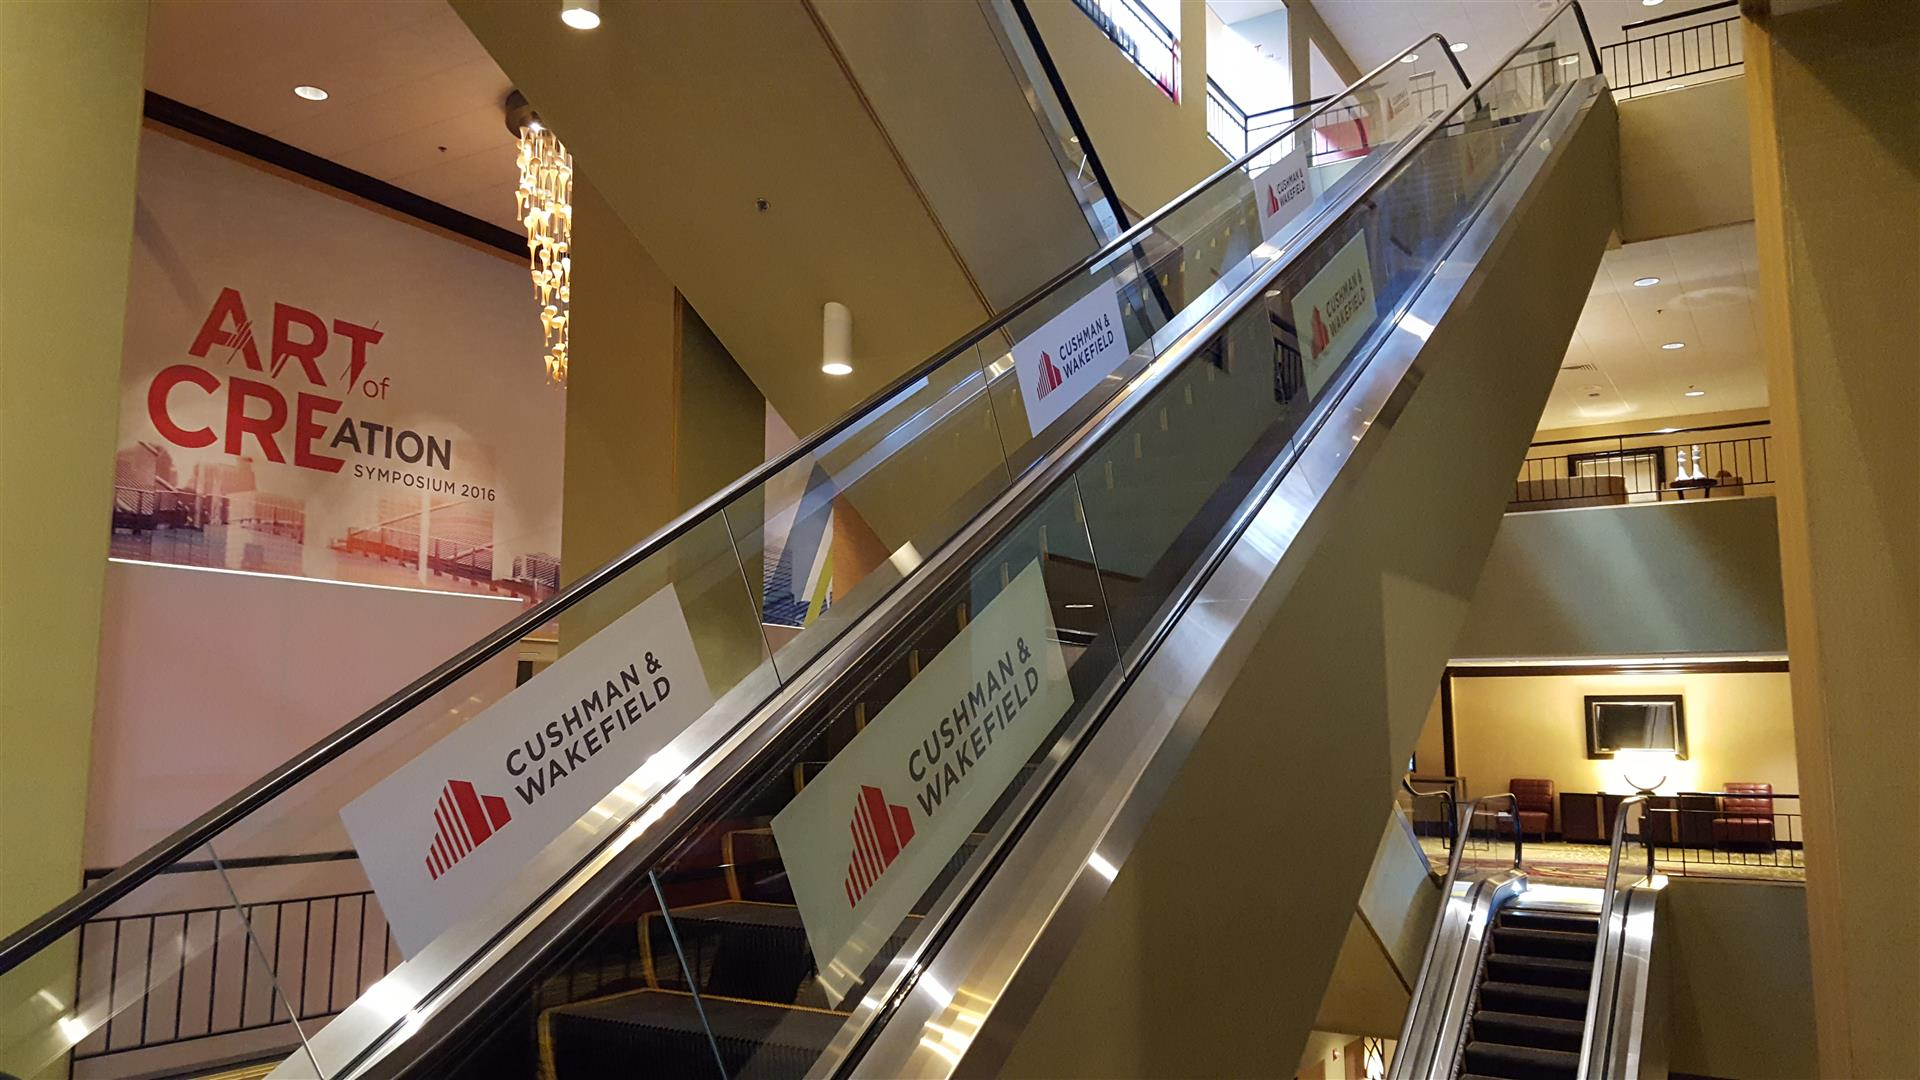 Cushman & Wakefield Escalator Signs